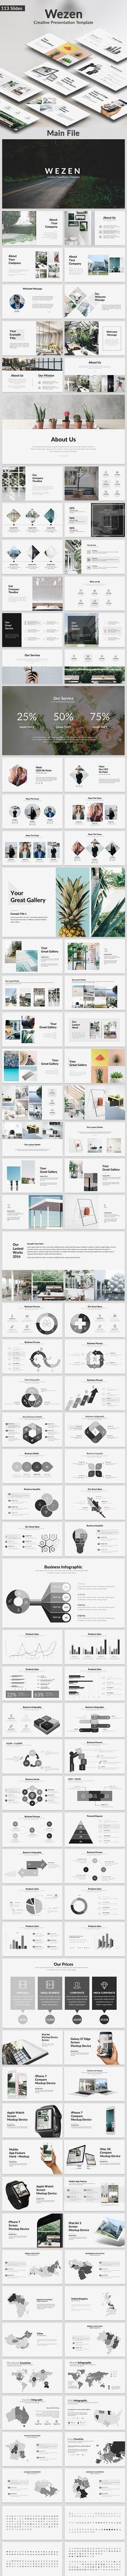 Wezen  Creative Google Slide Template — Google Slides PPTX #easy #free icons • Download ➝ https://graphicriver.net/item/wezen-creative-google-slide-template/19426874?ref=pxcr